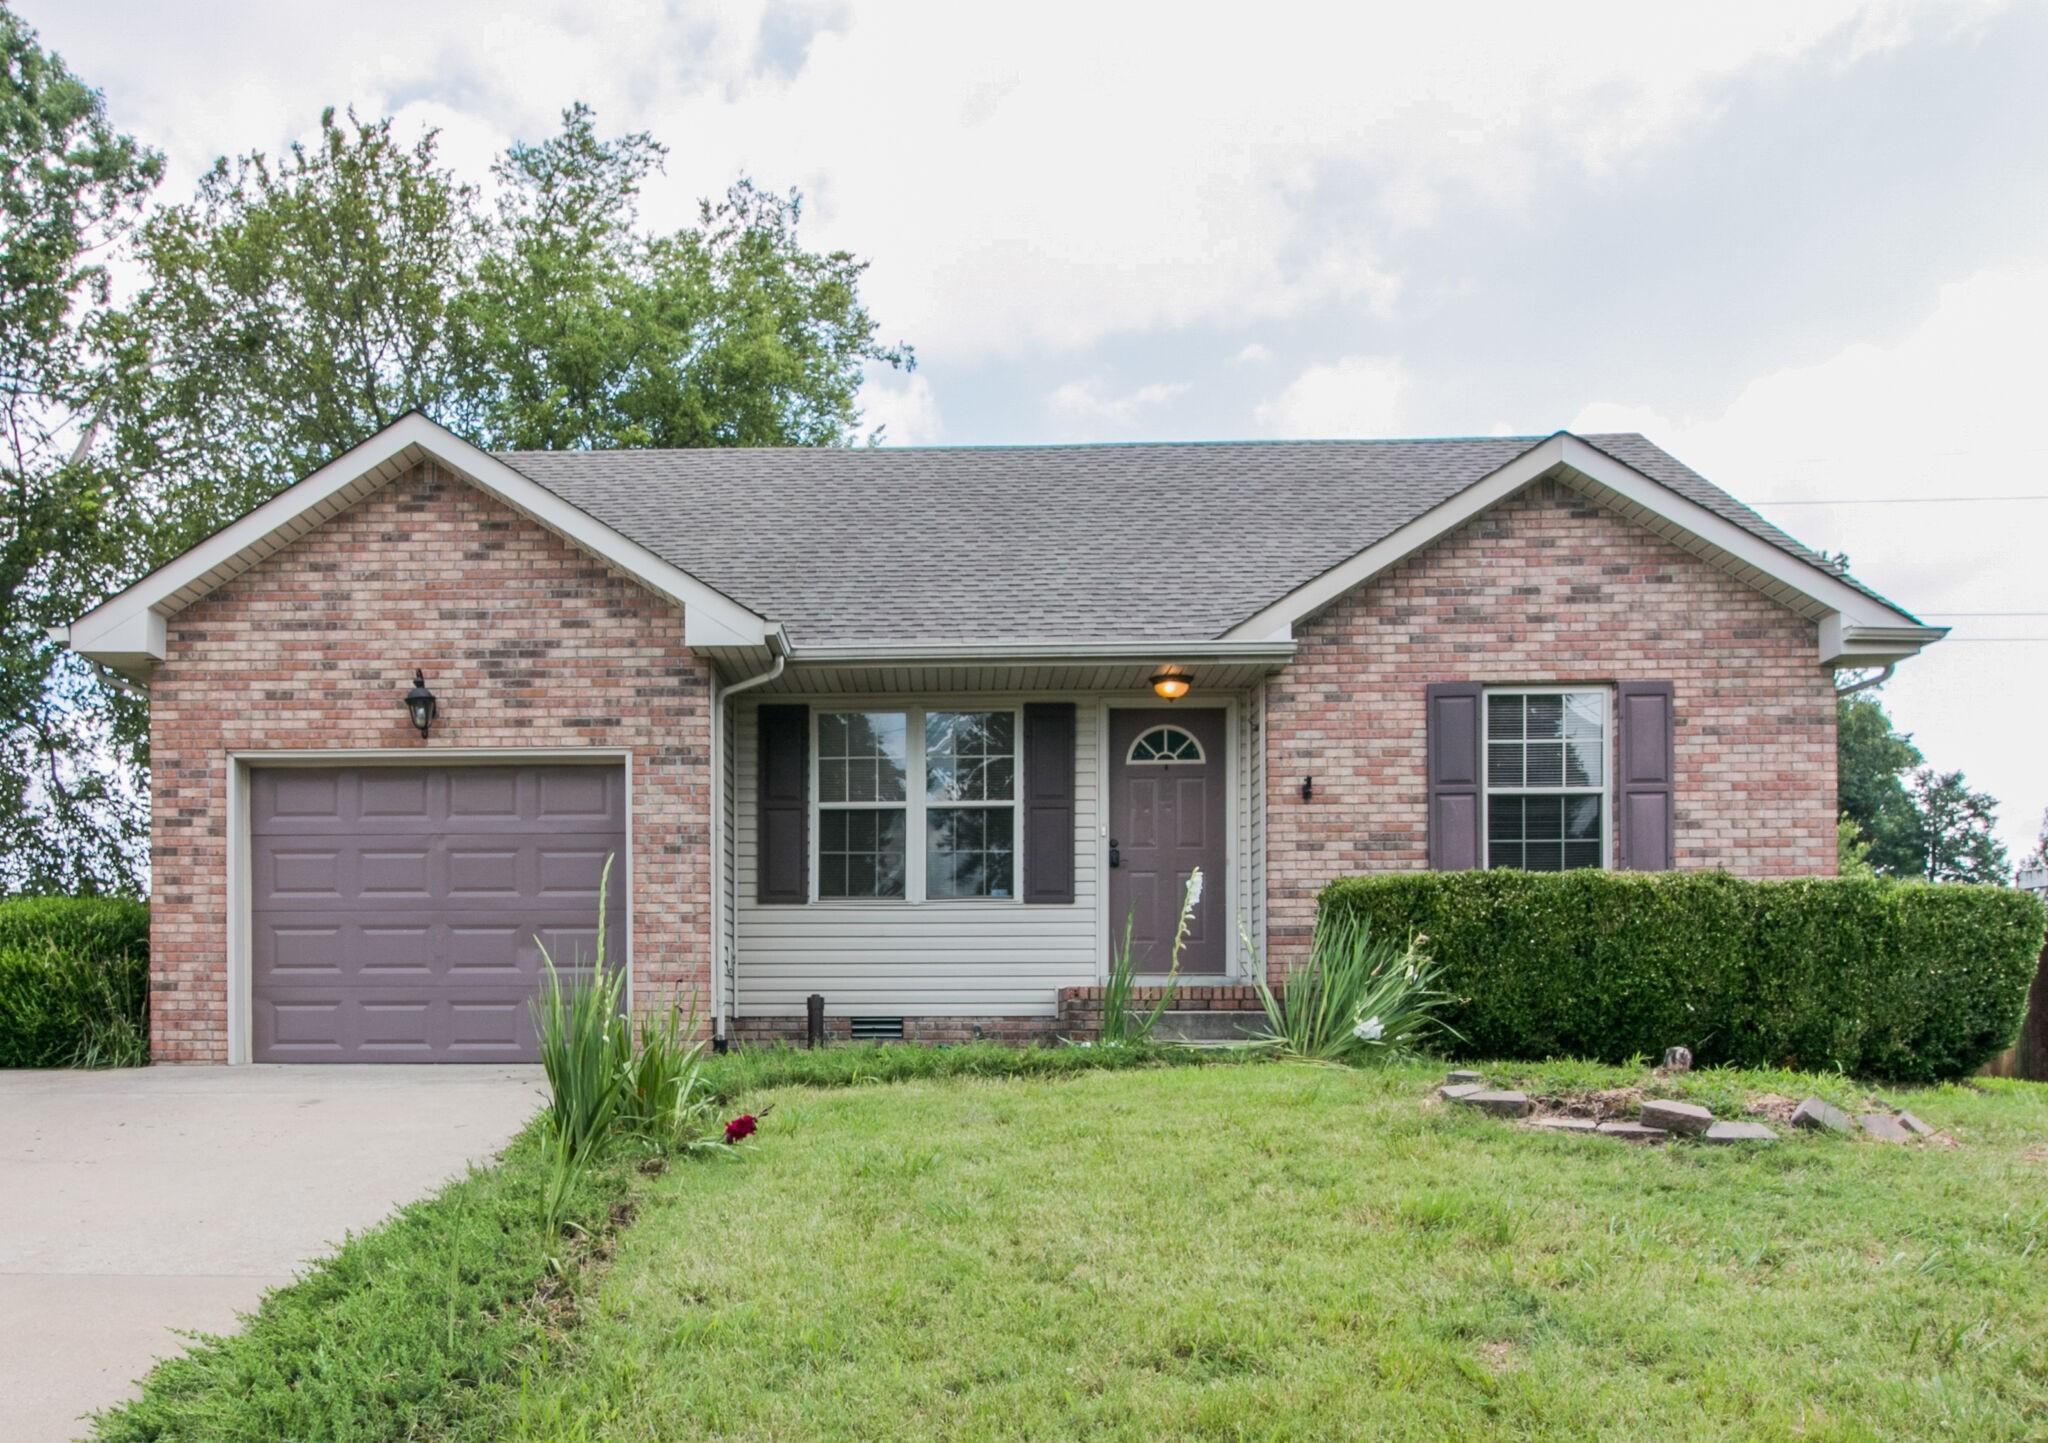 2503 Rafiki Dr Property Photo - Clarksville, TN real estate listing